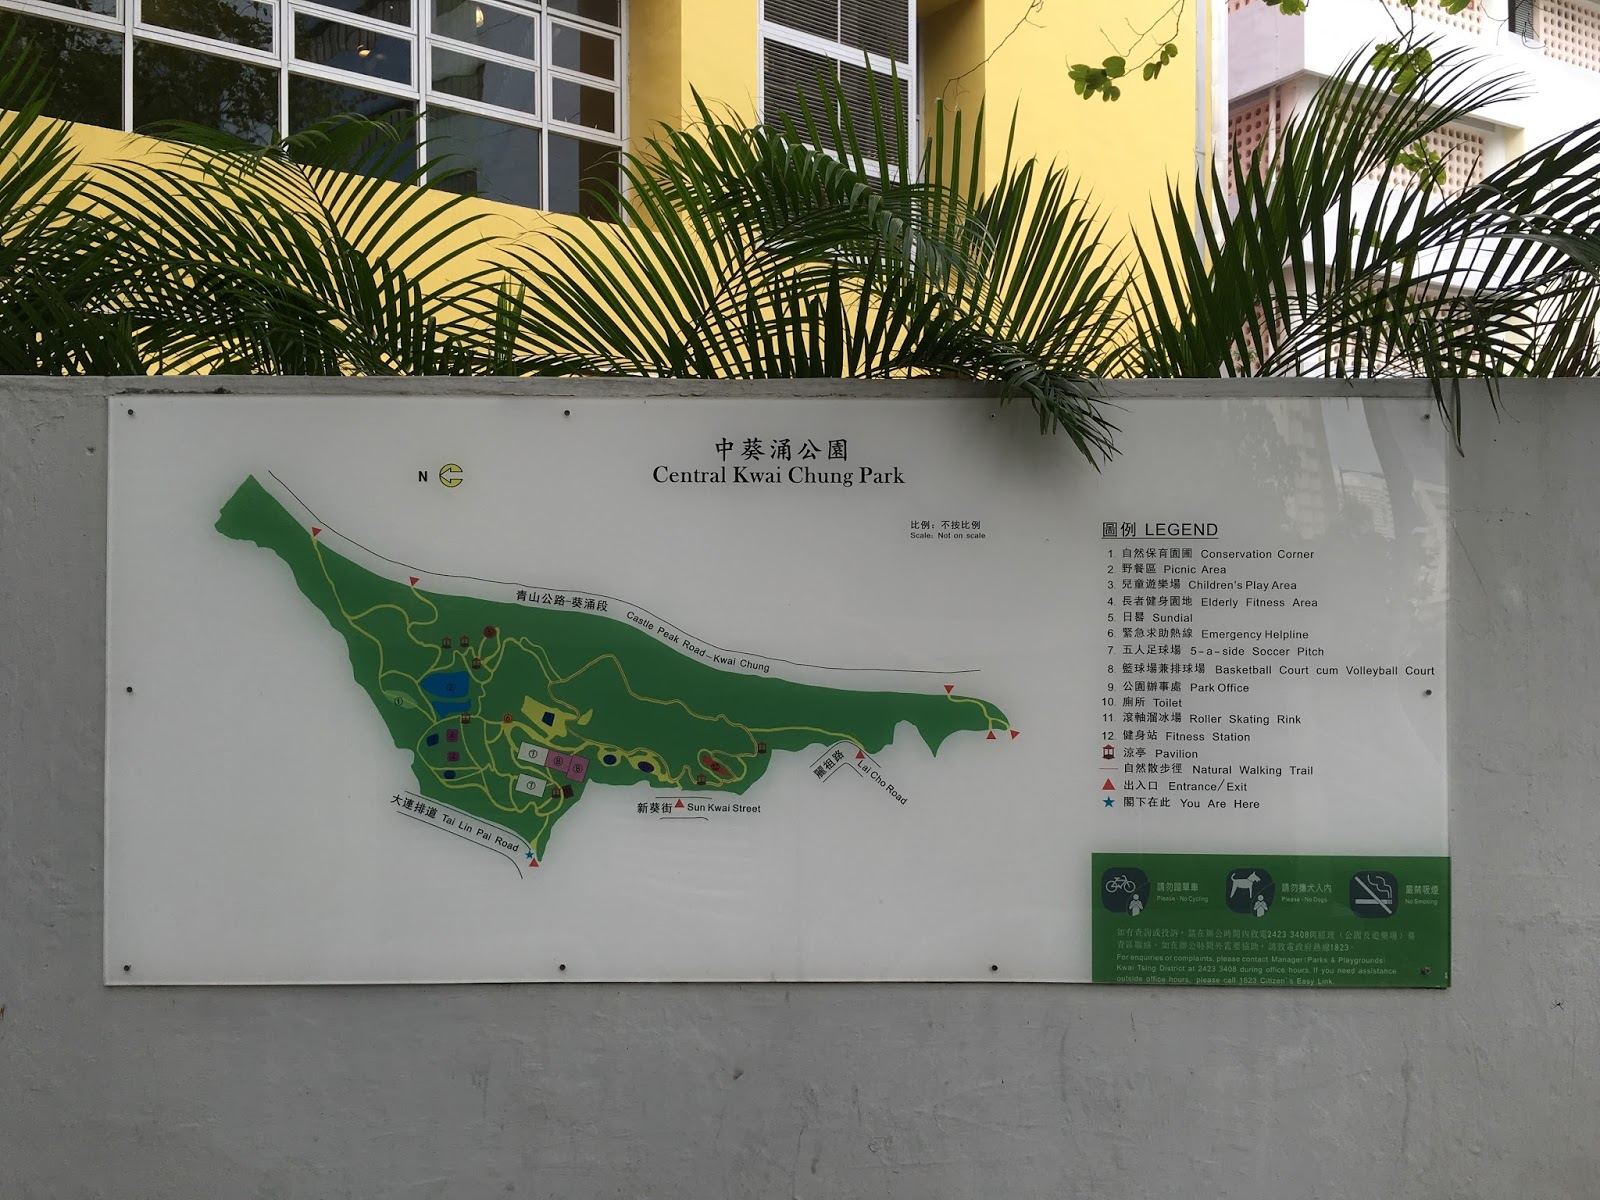 Soldier 的世界: 中葵涌公園及牛池灣公園